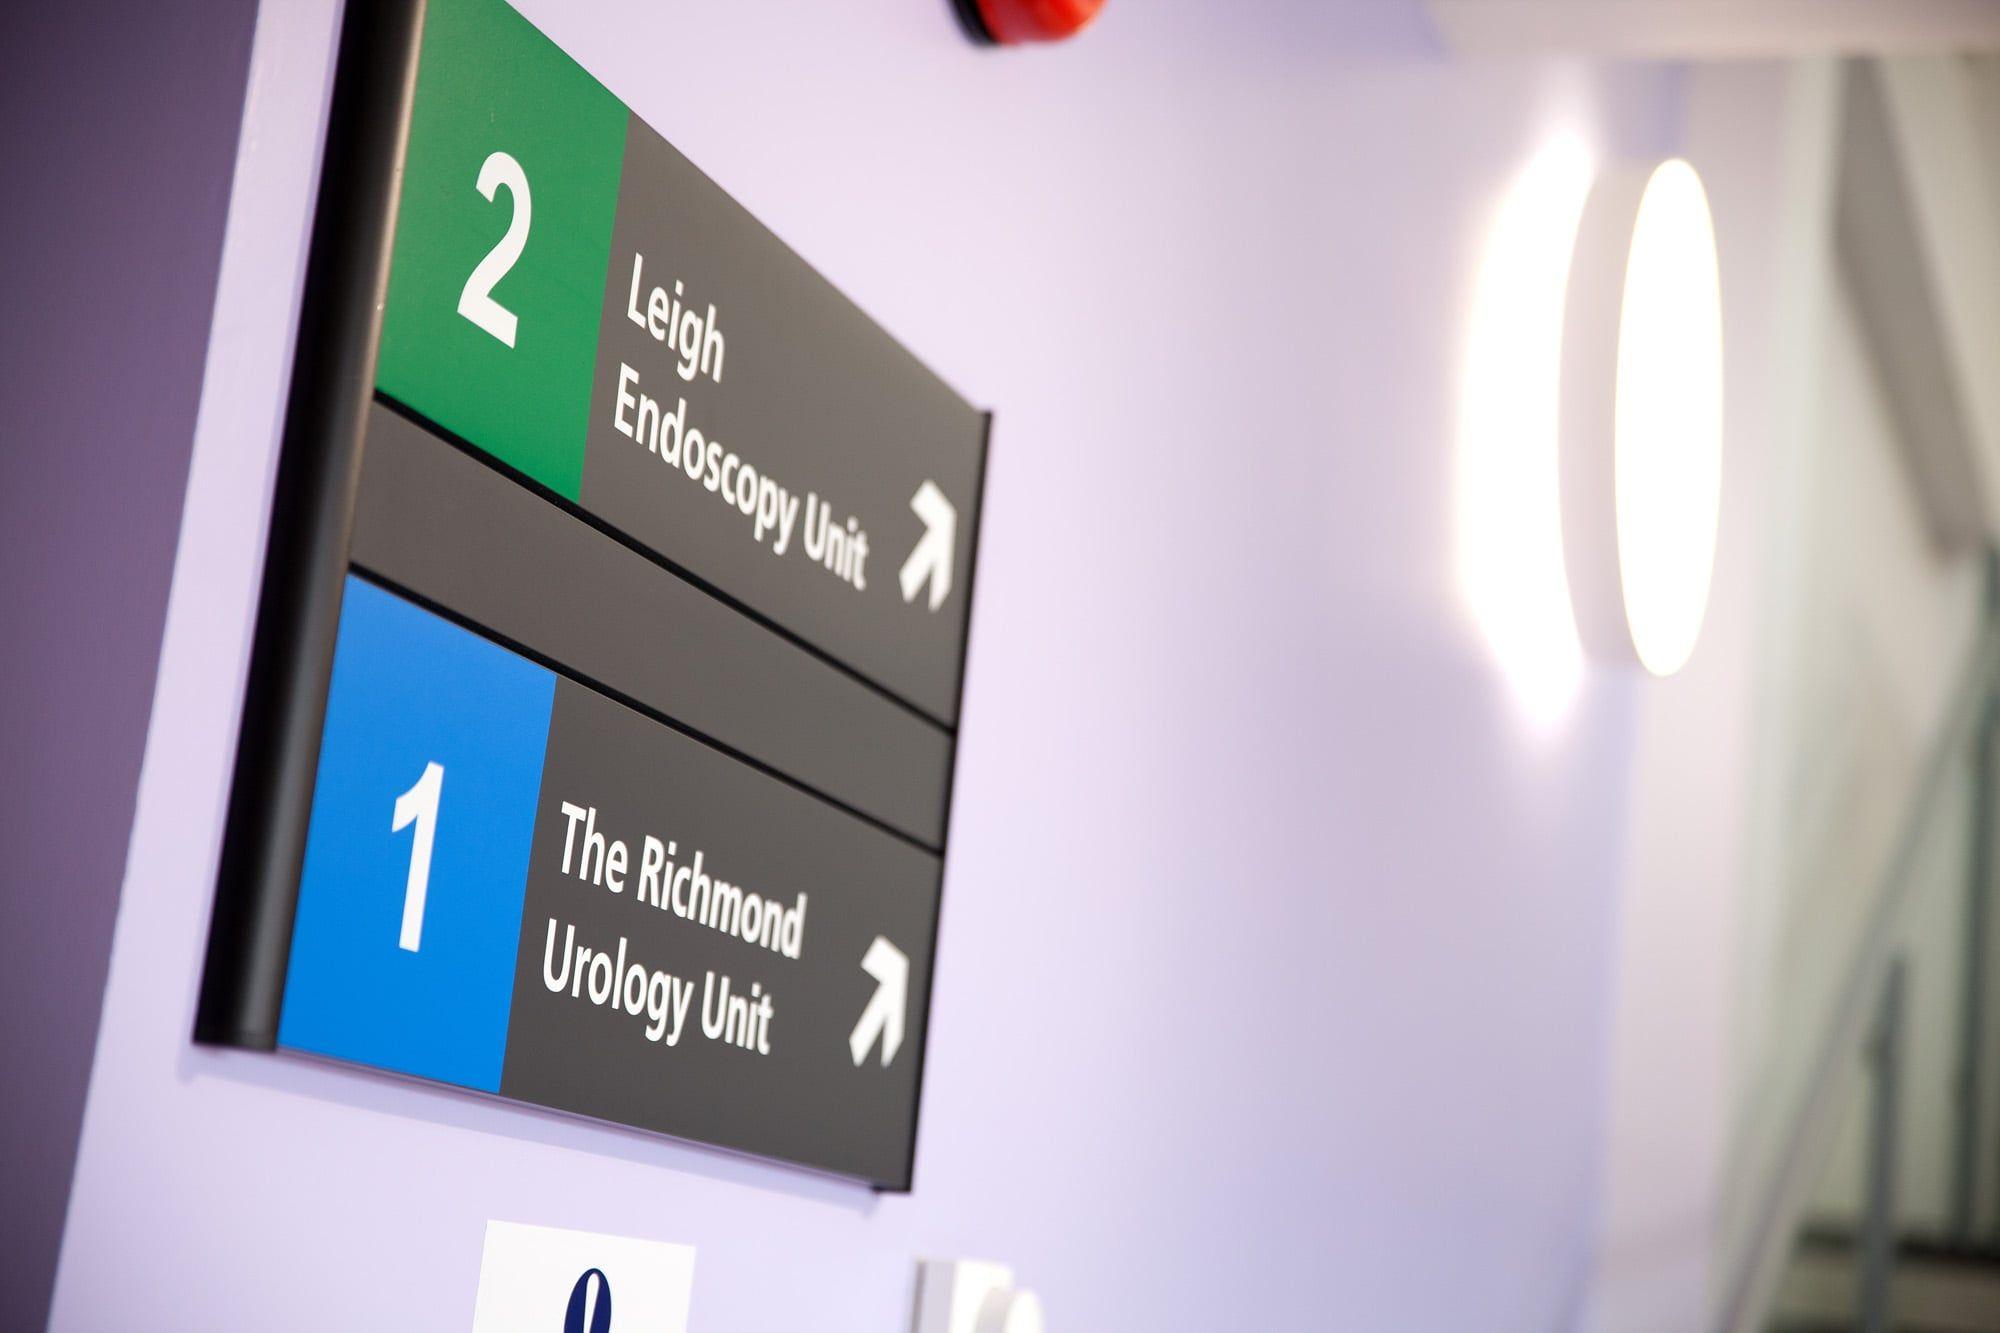 Hospital wayfinding floor signage